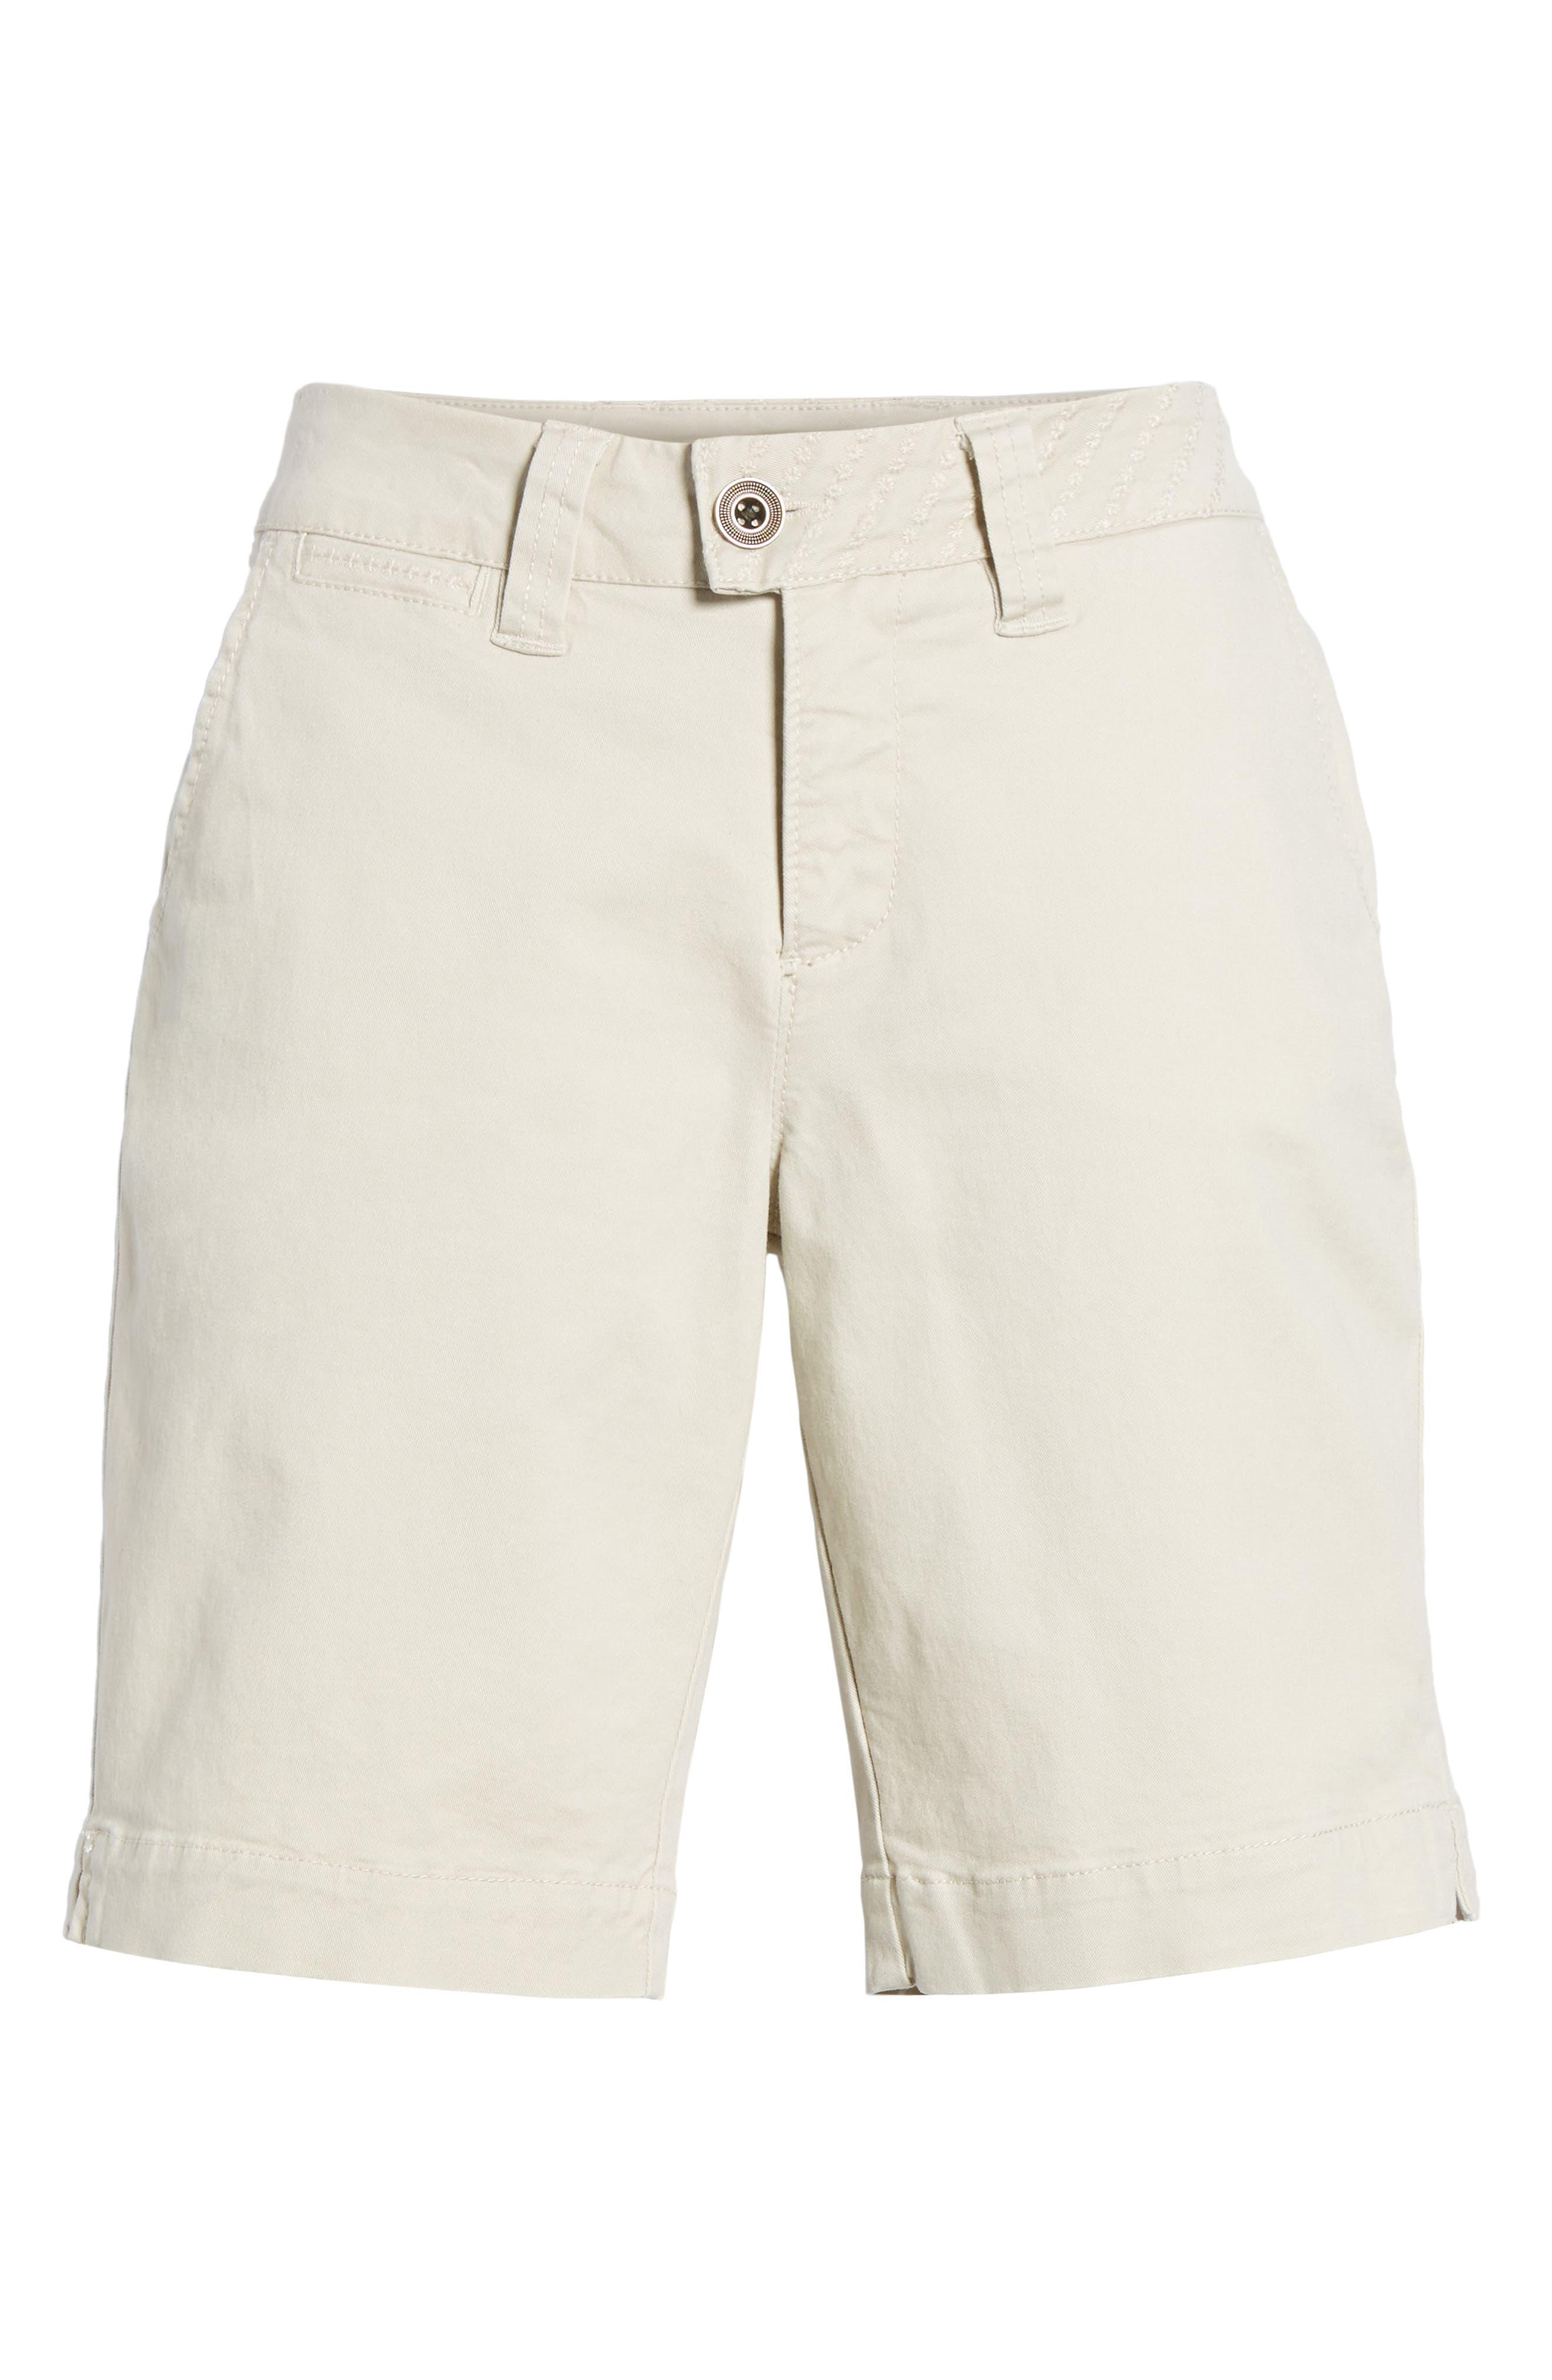 Creston Twill Shorts,                             Alternate thumbnail 6, color,                             Stone